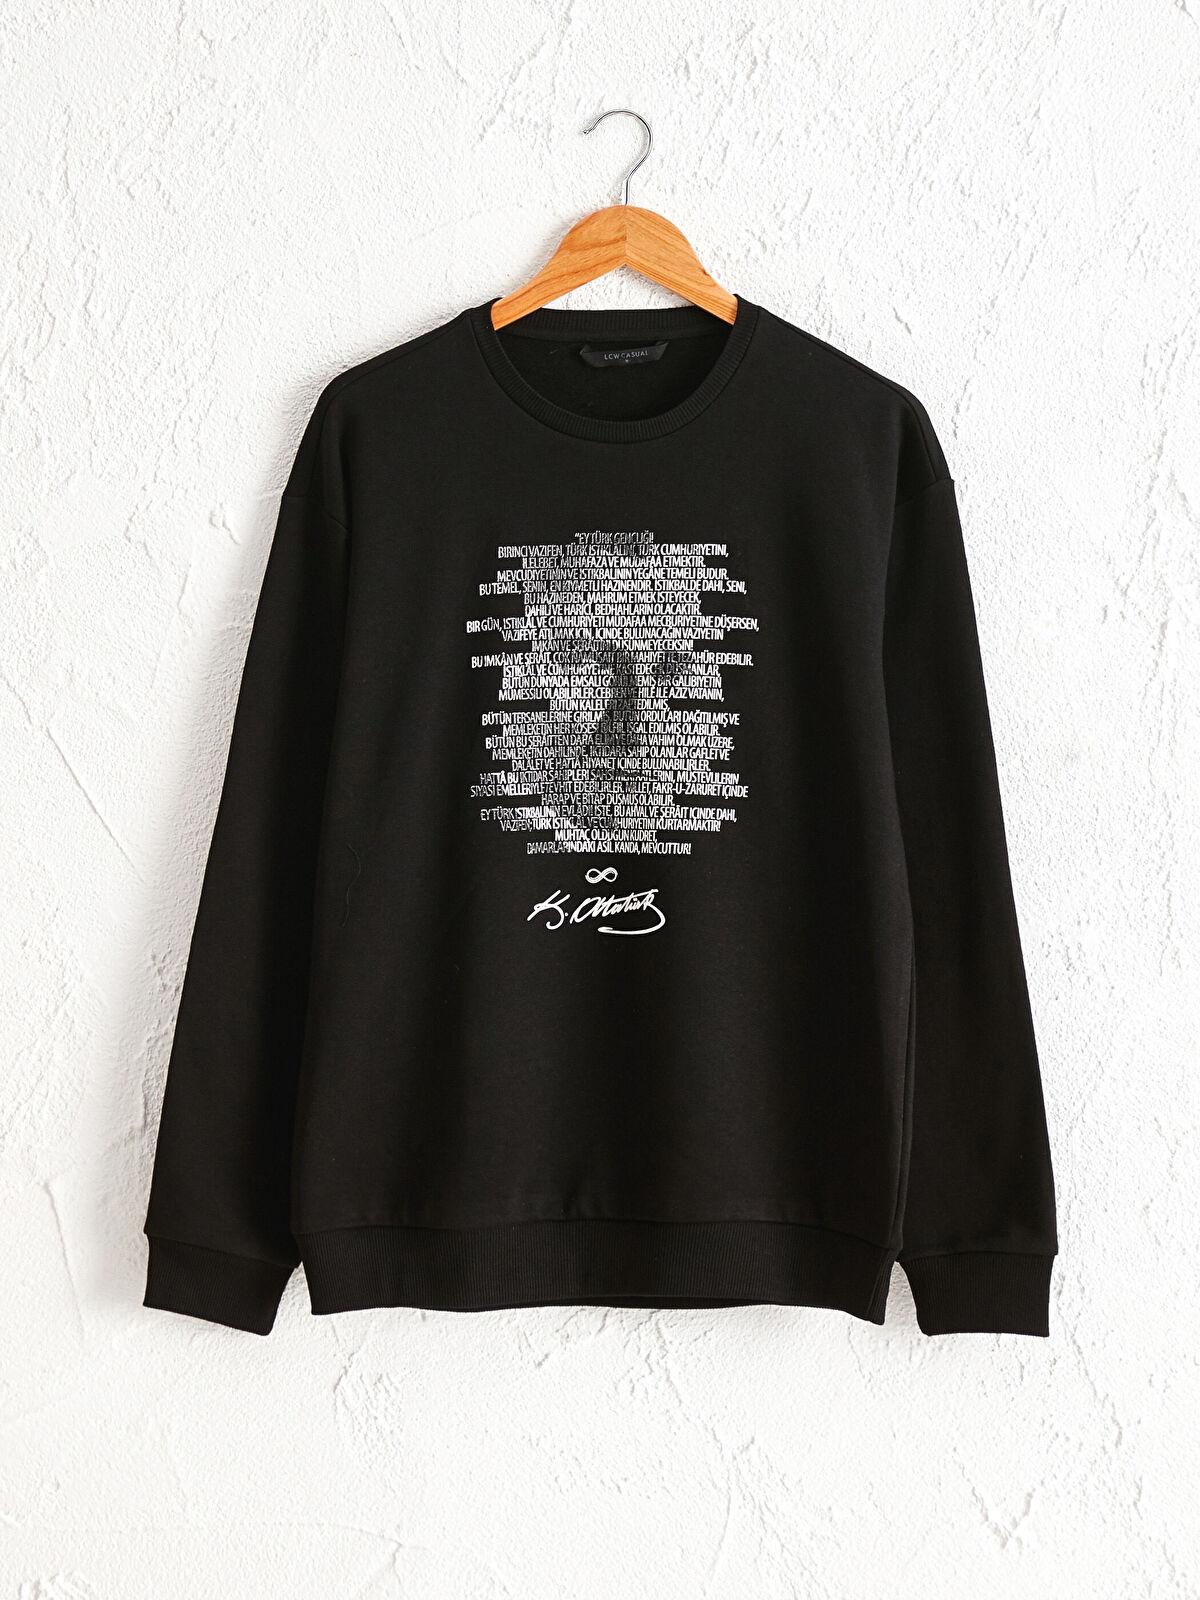 Atatürk Baskılı Pamuklu Sweatshirt - LC WAIKIKI